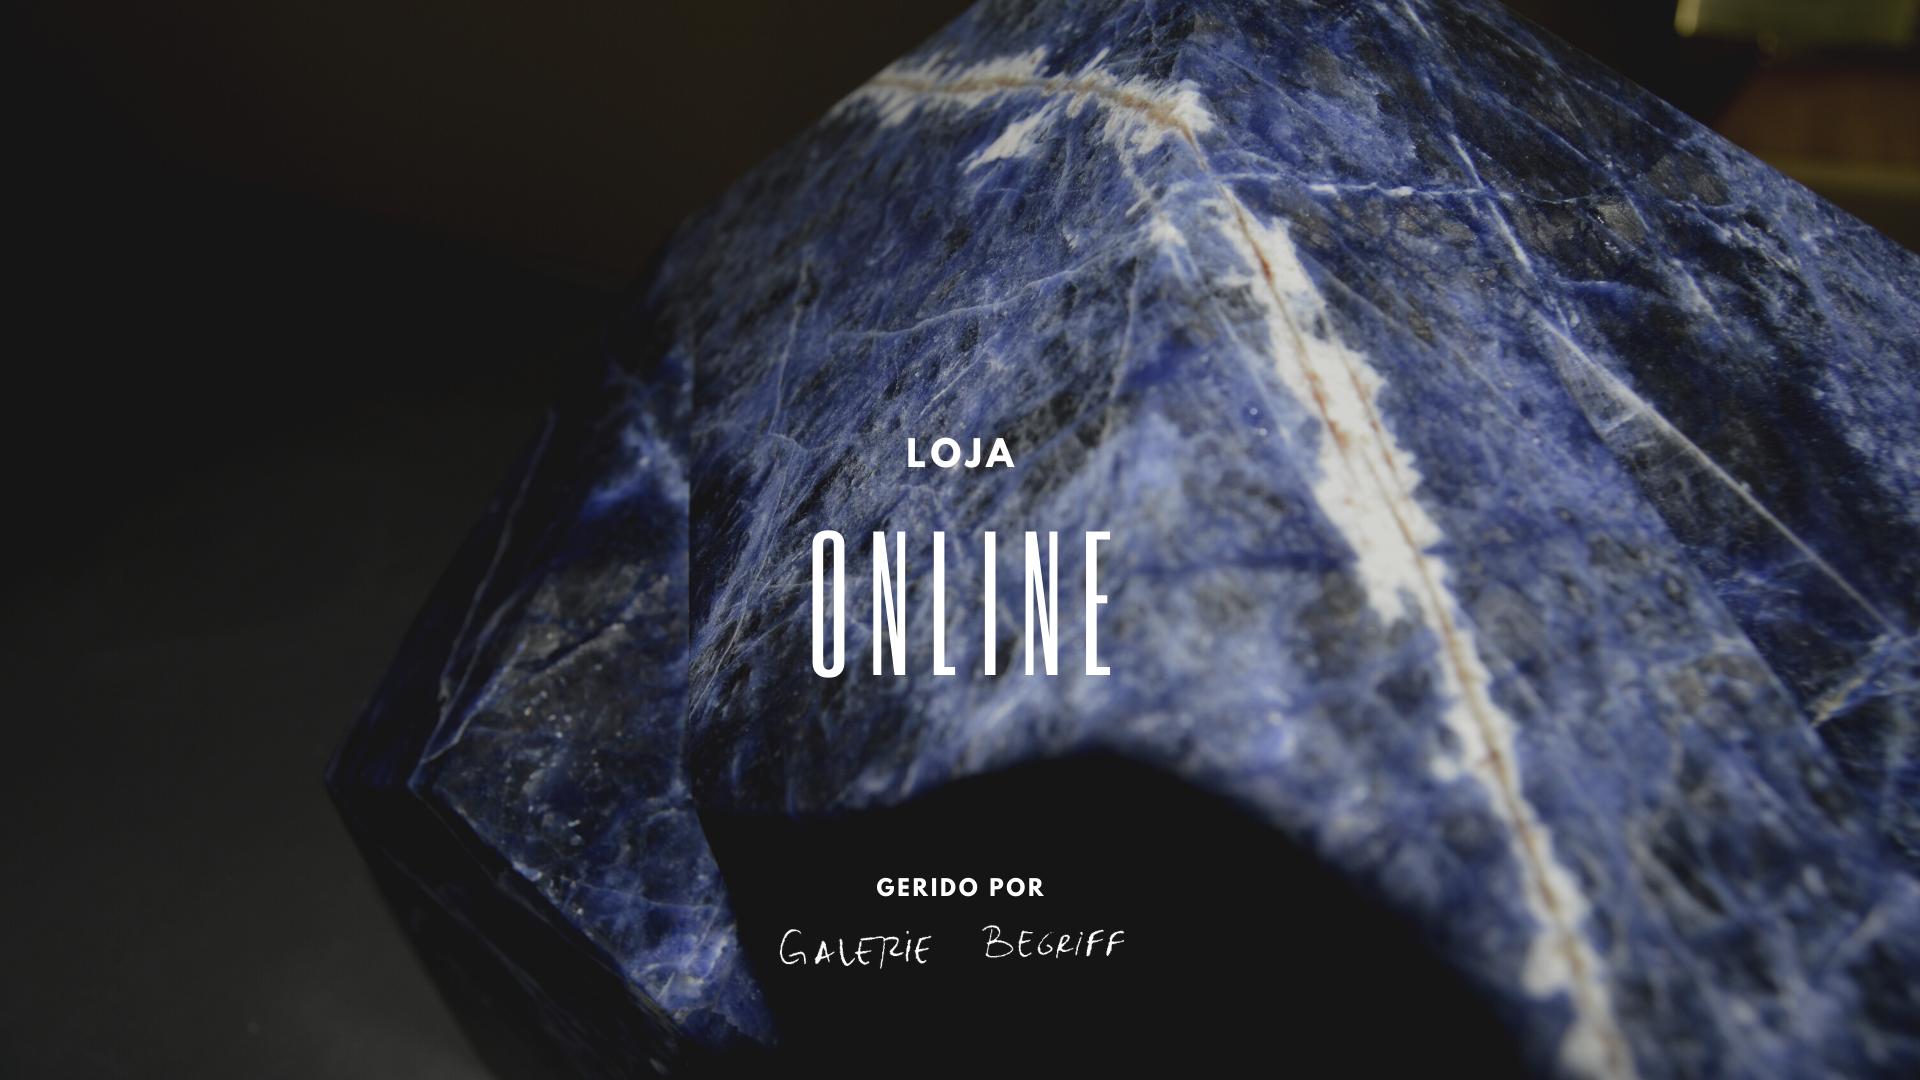 loja_online_by_galerie_begriff